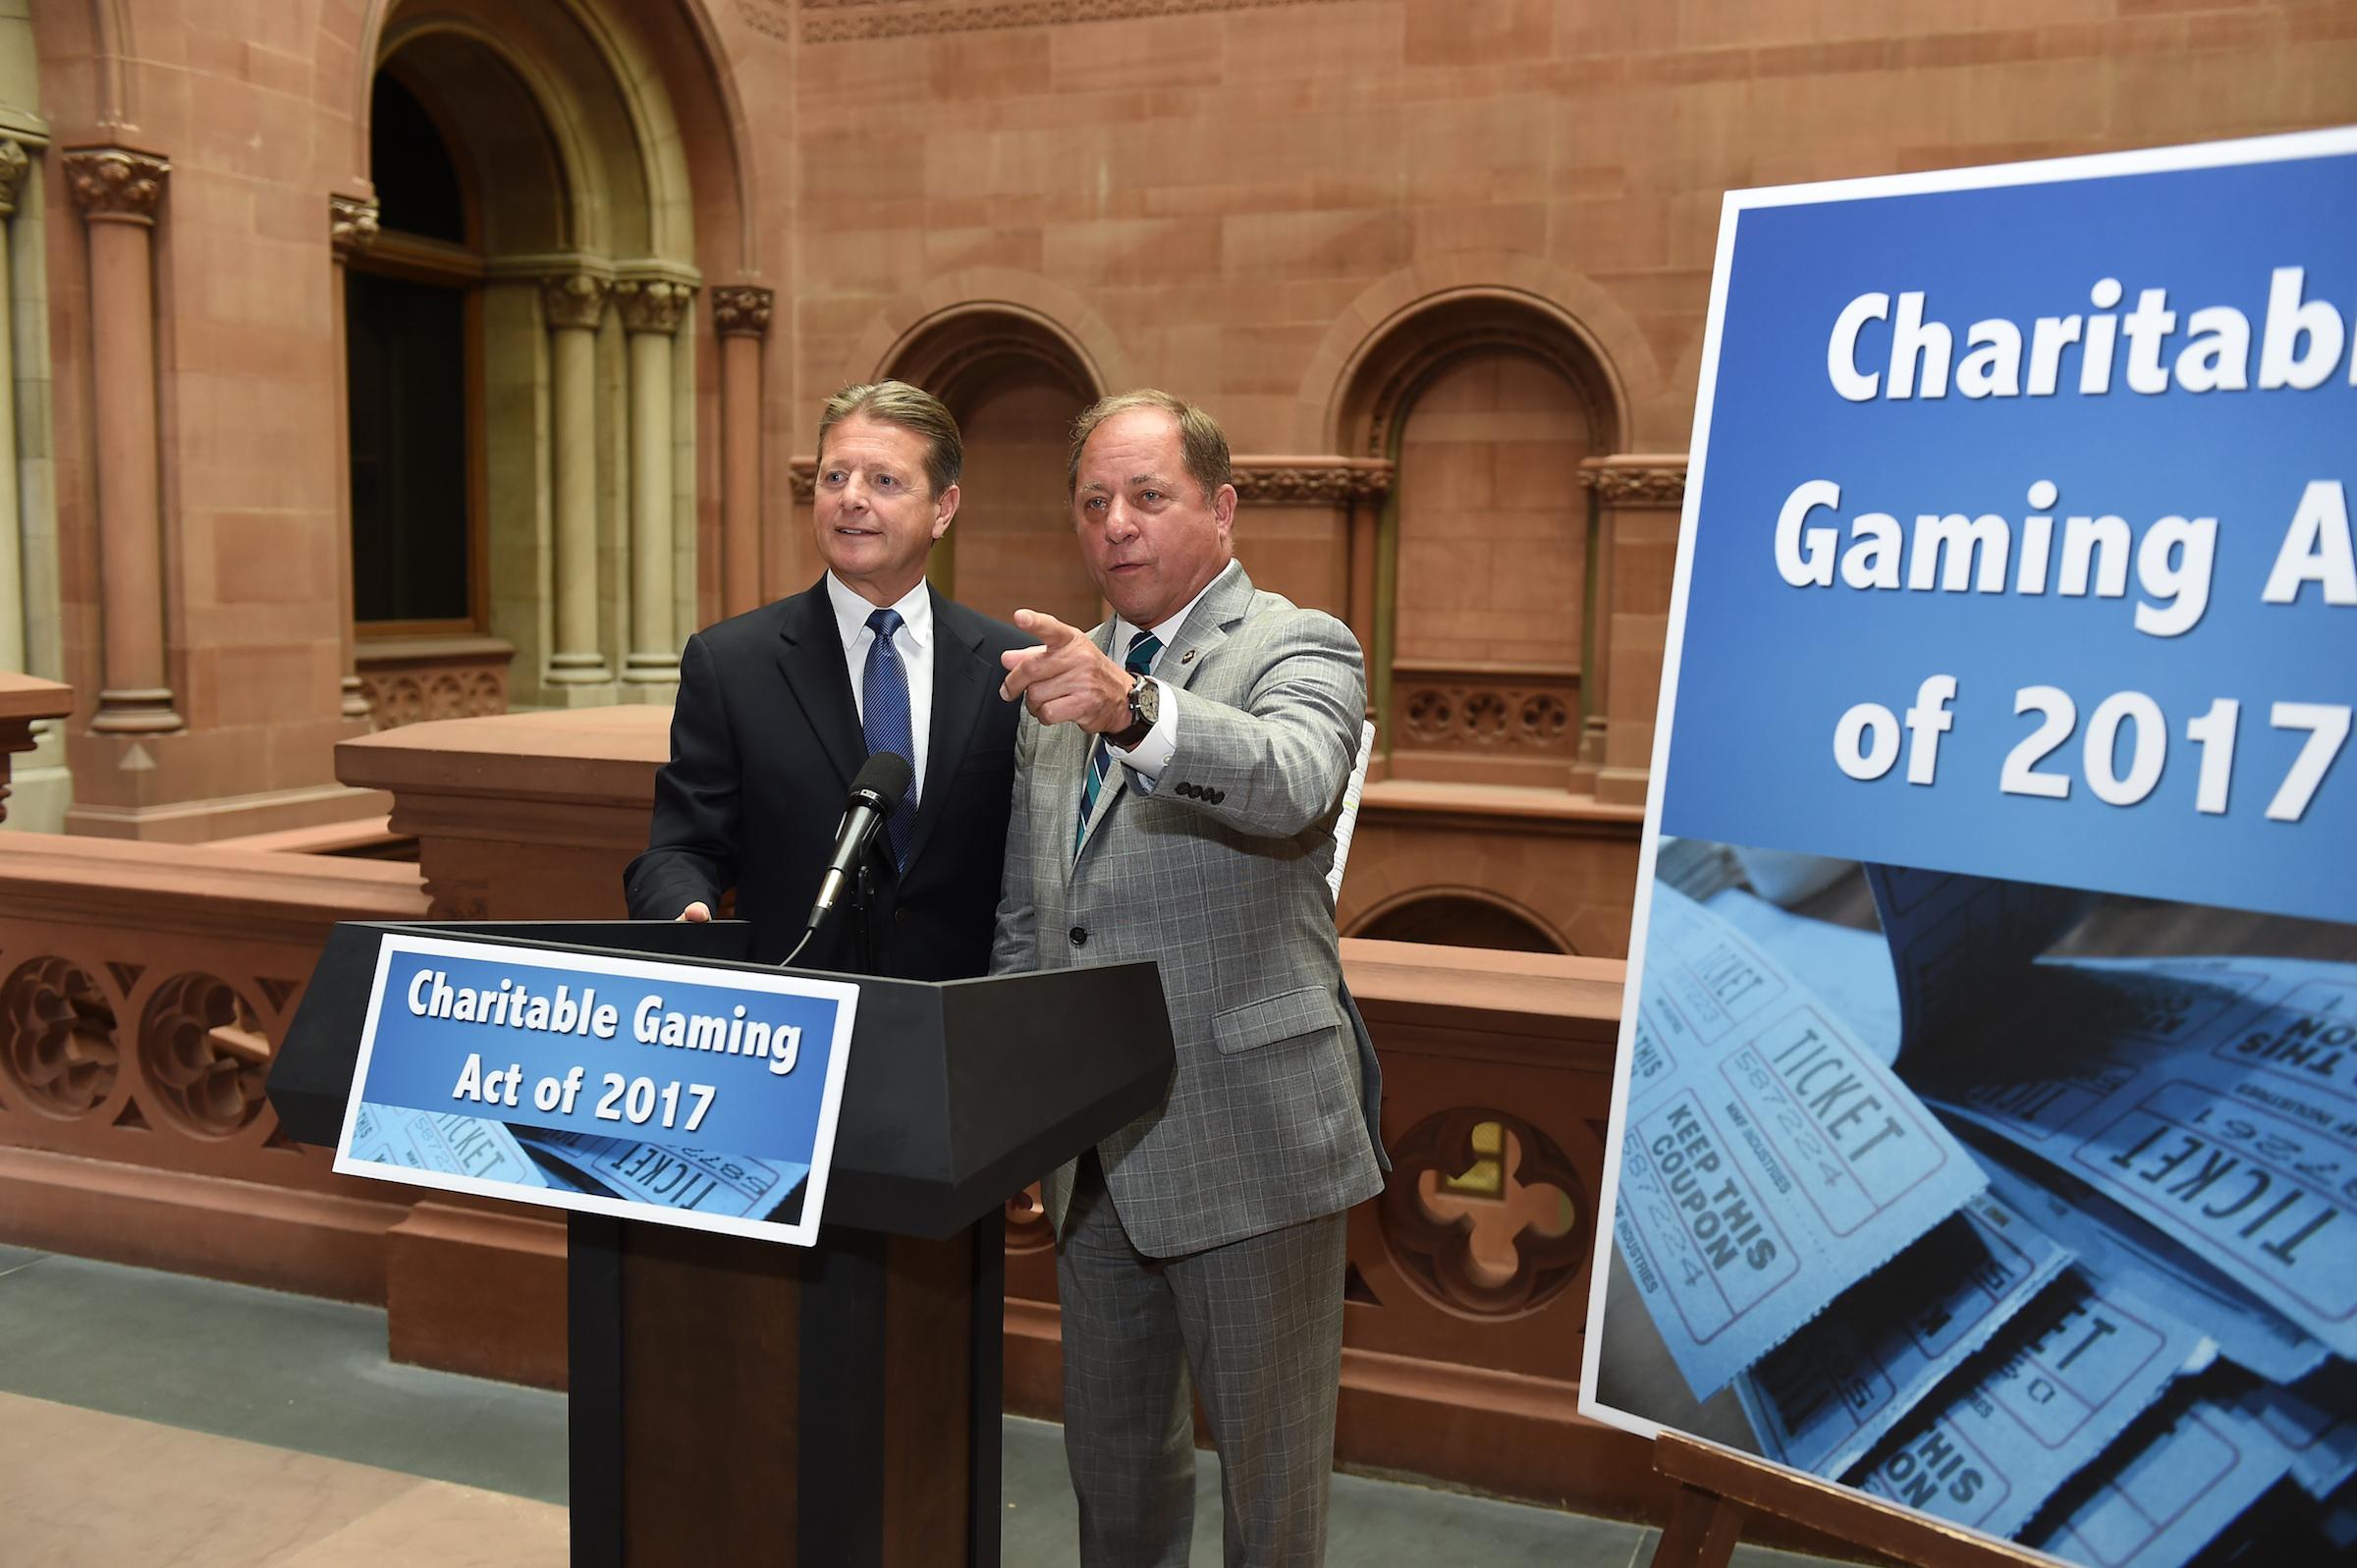 Charitable_Gaming_Presser_6-6-17.jpg